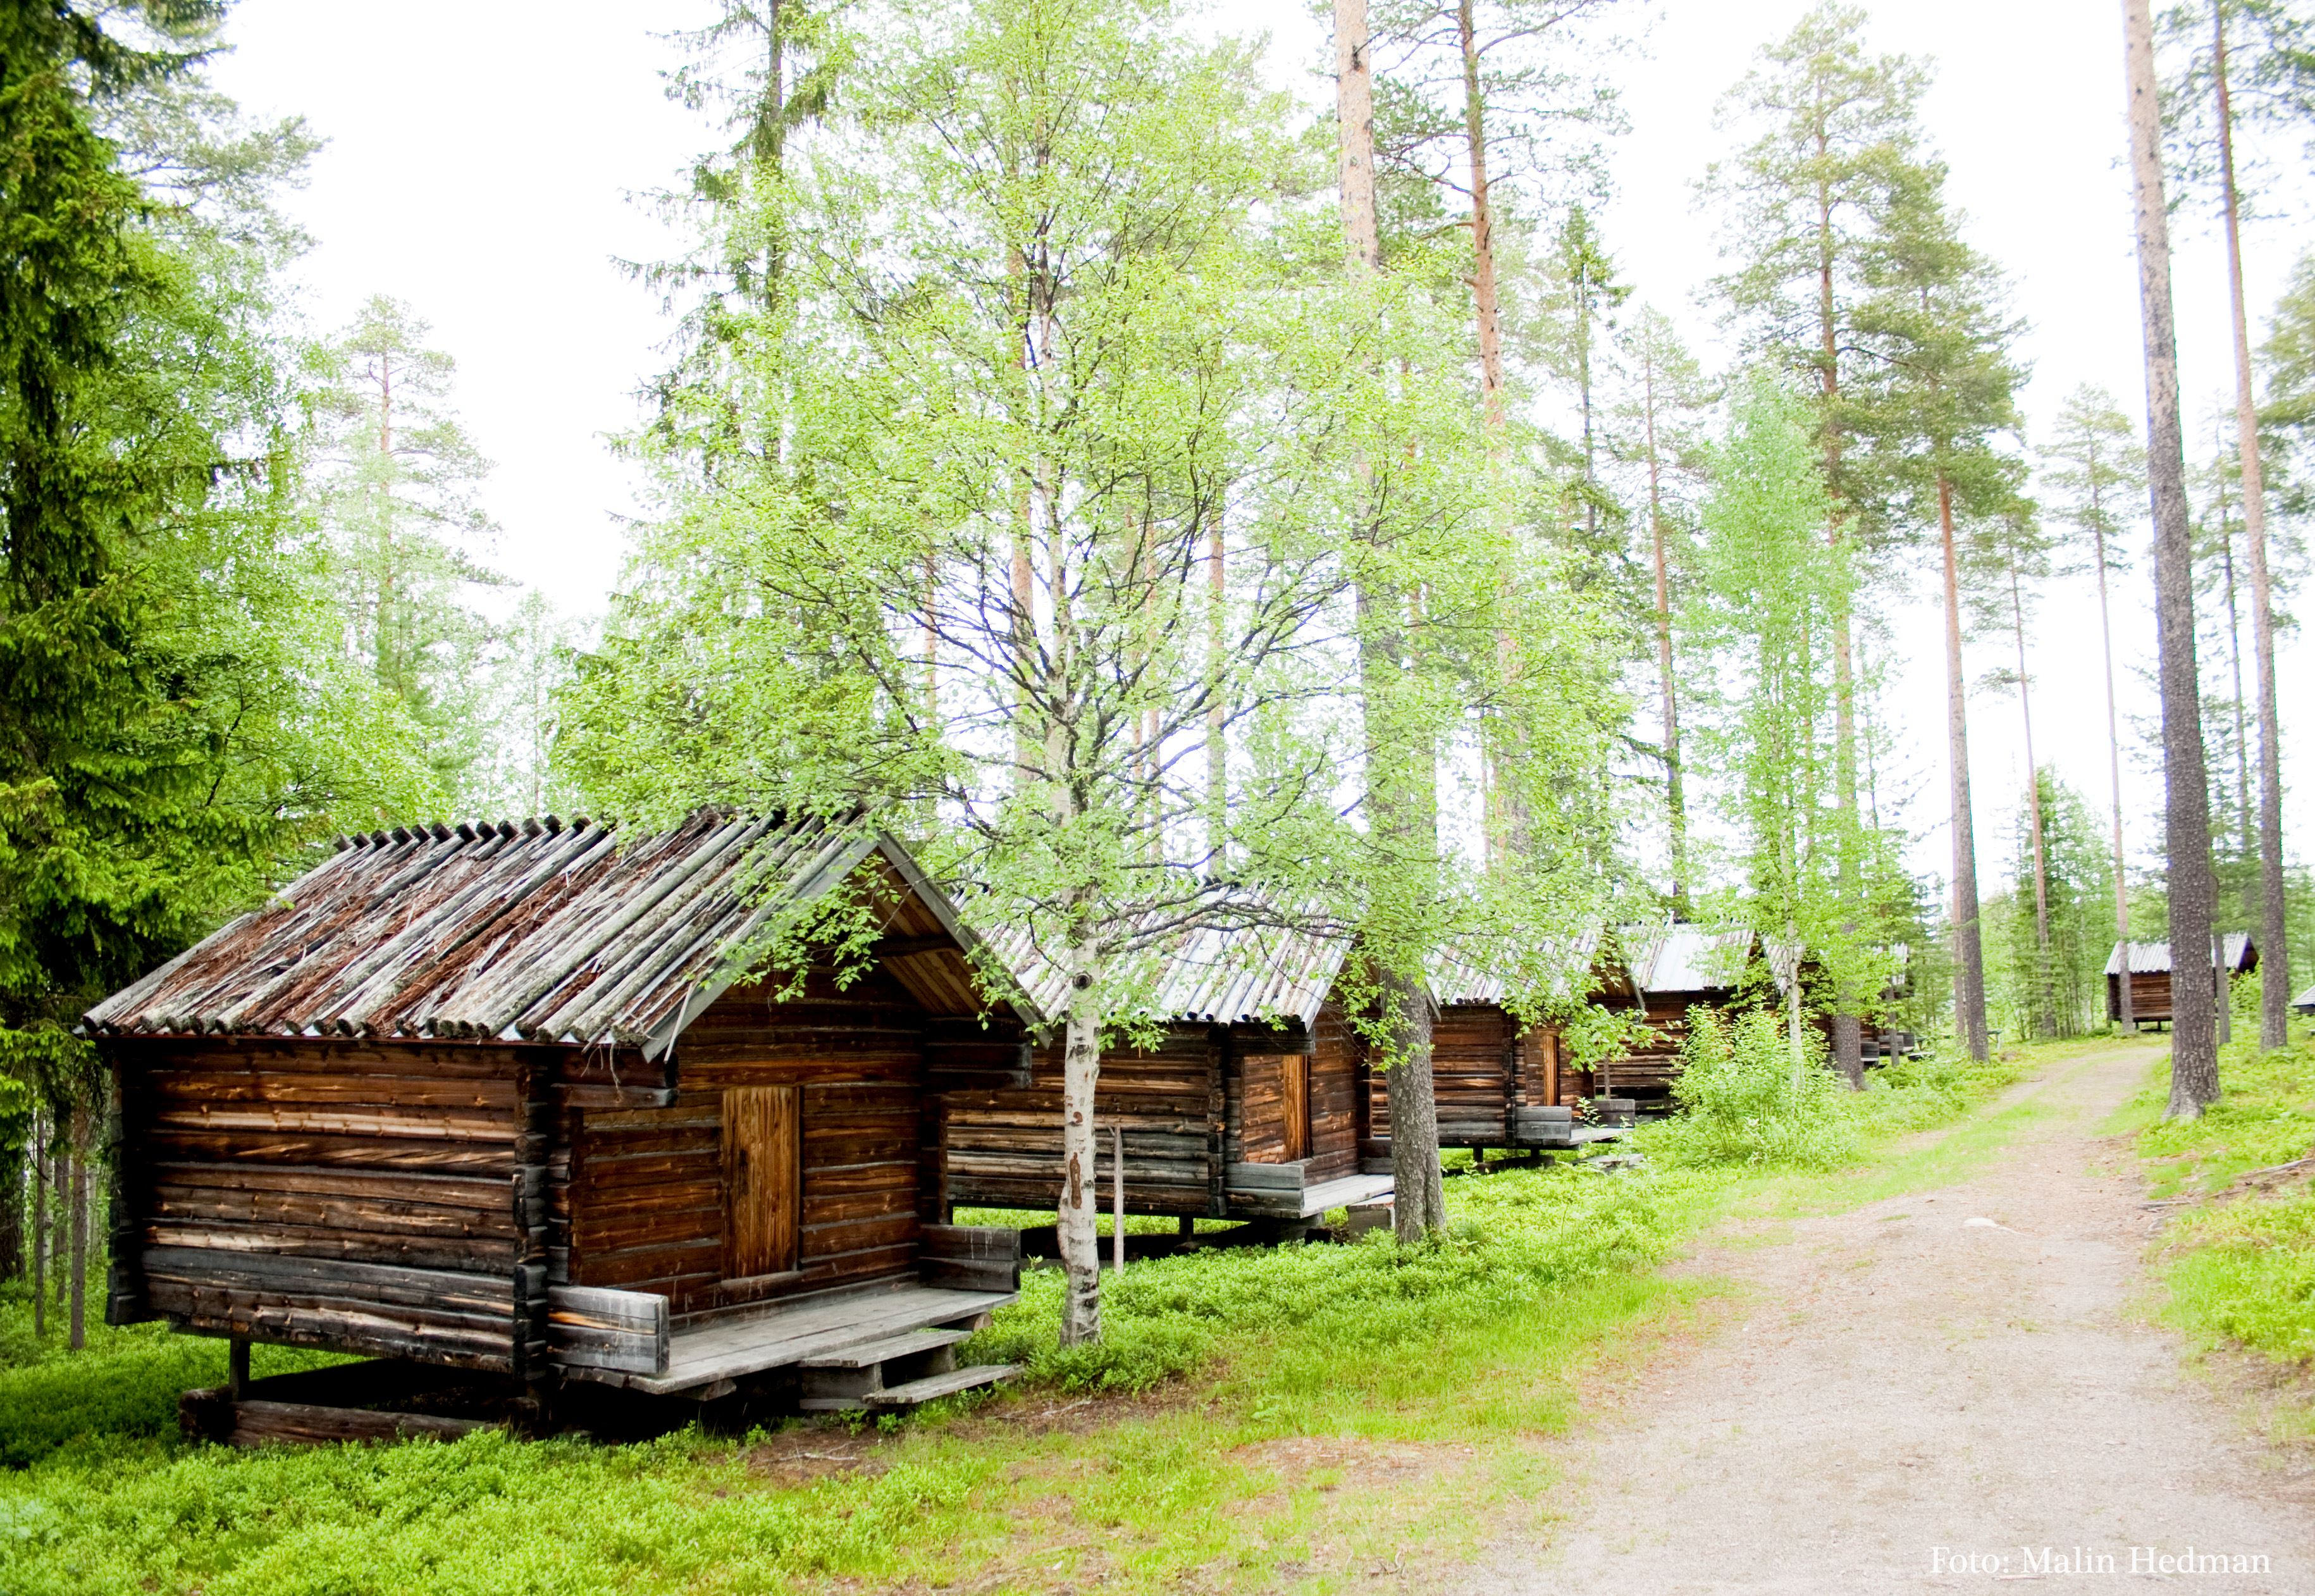 Malin Hedman,  © Malå kommun, Lappstan